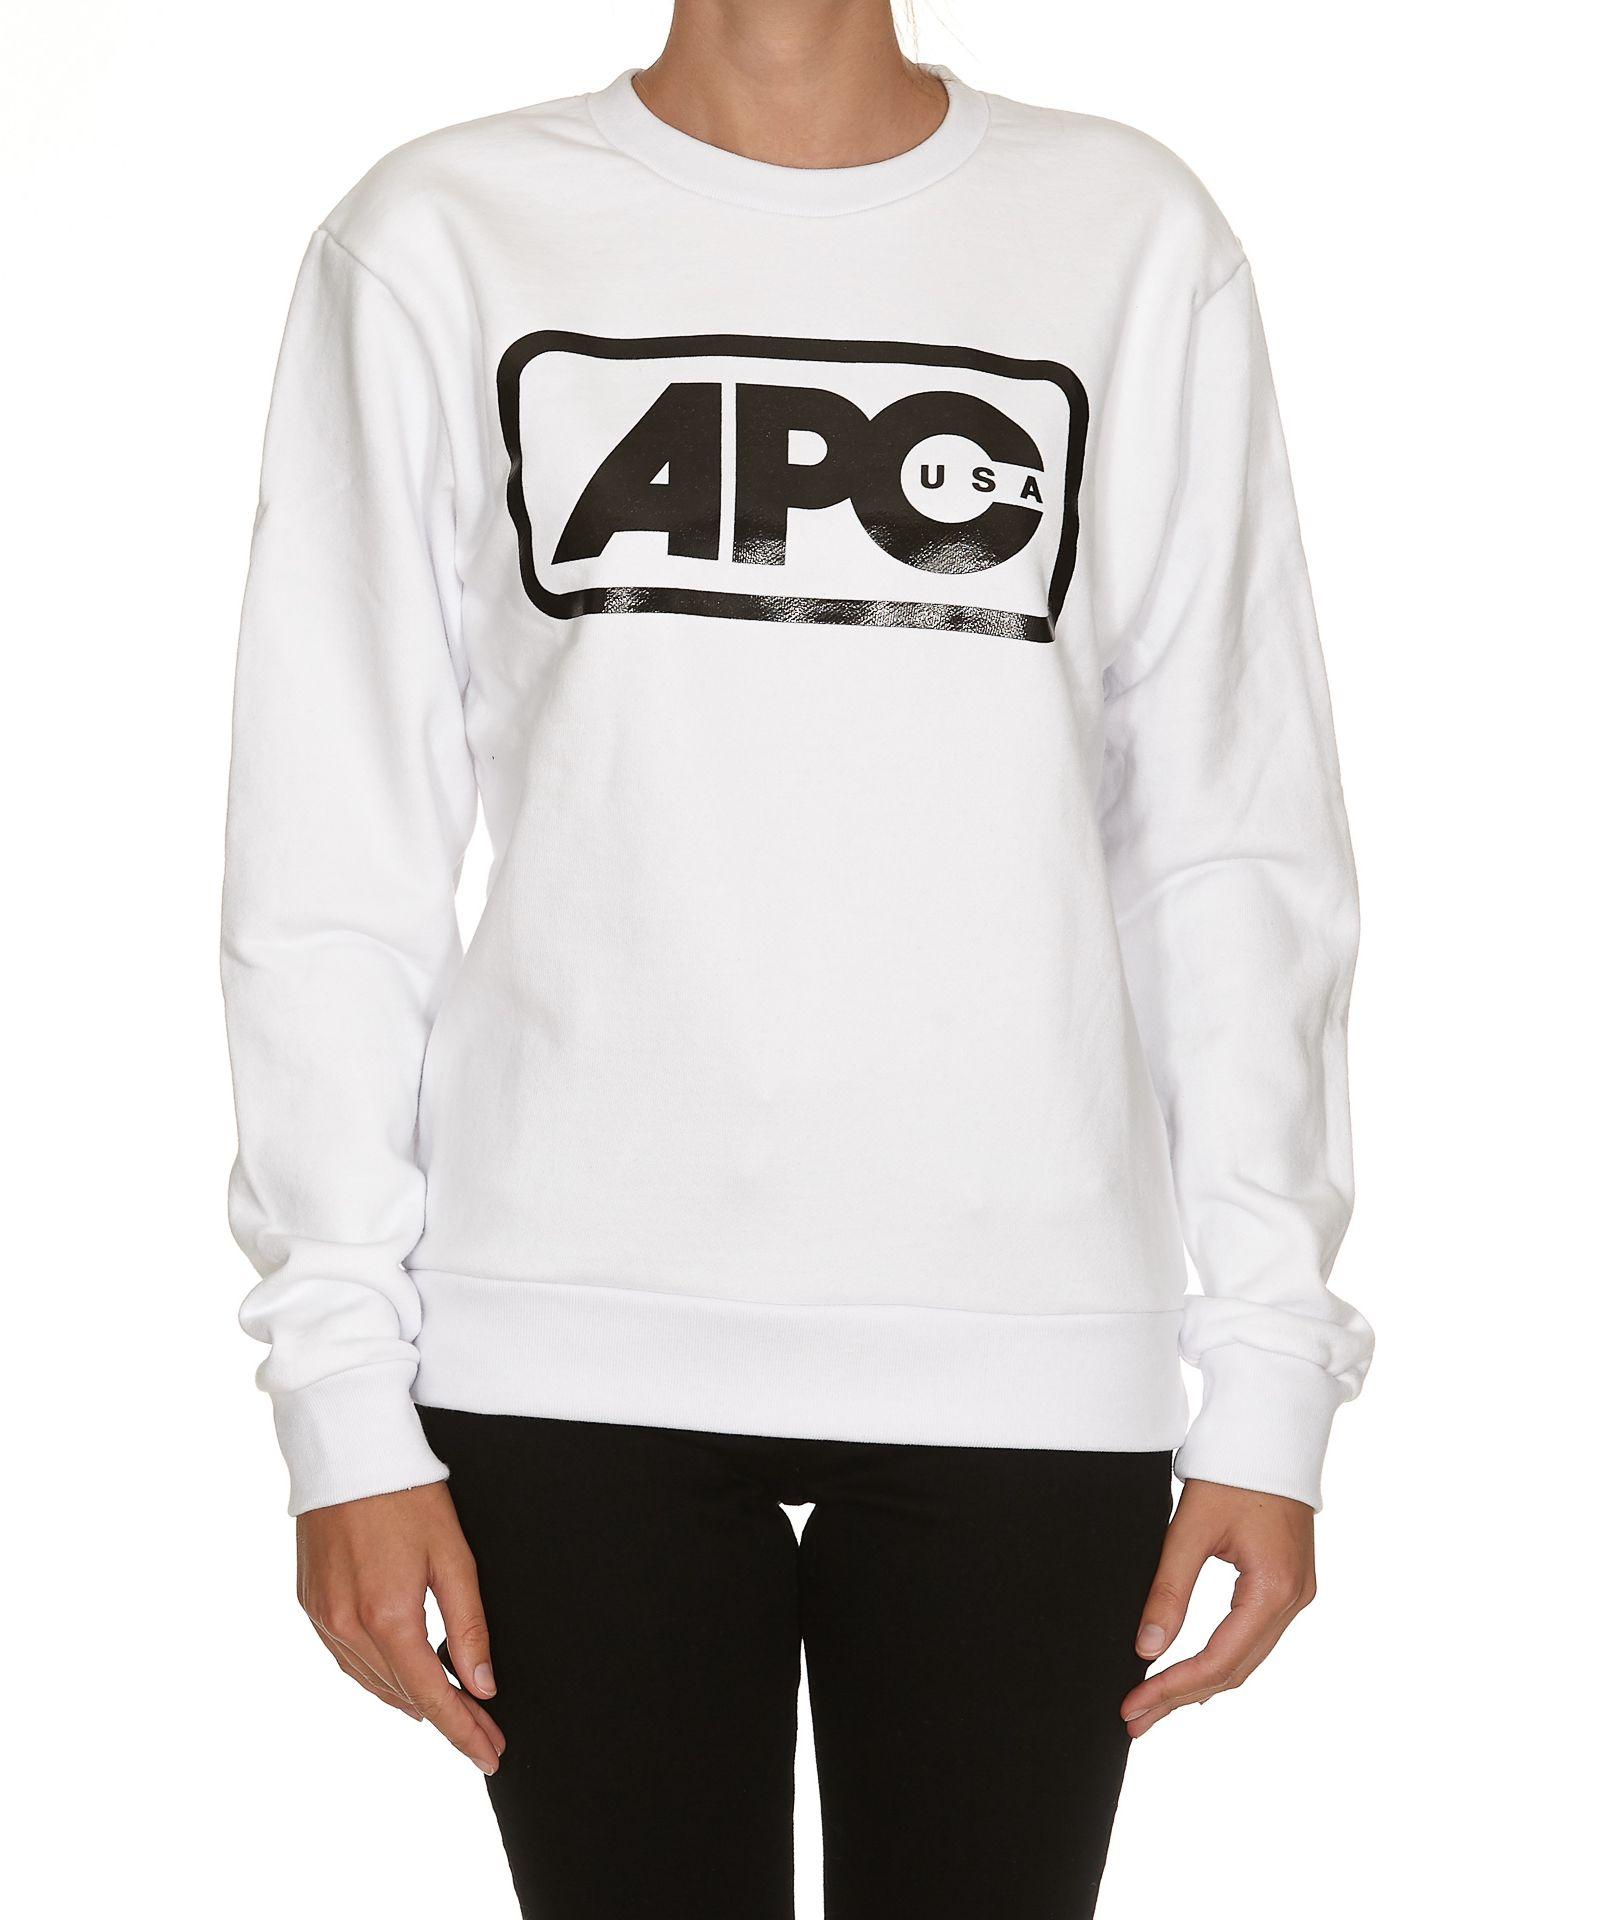 A.p.c. Tops A.P.C. BERNARDETTE SWEATSHIRT